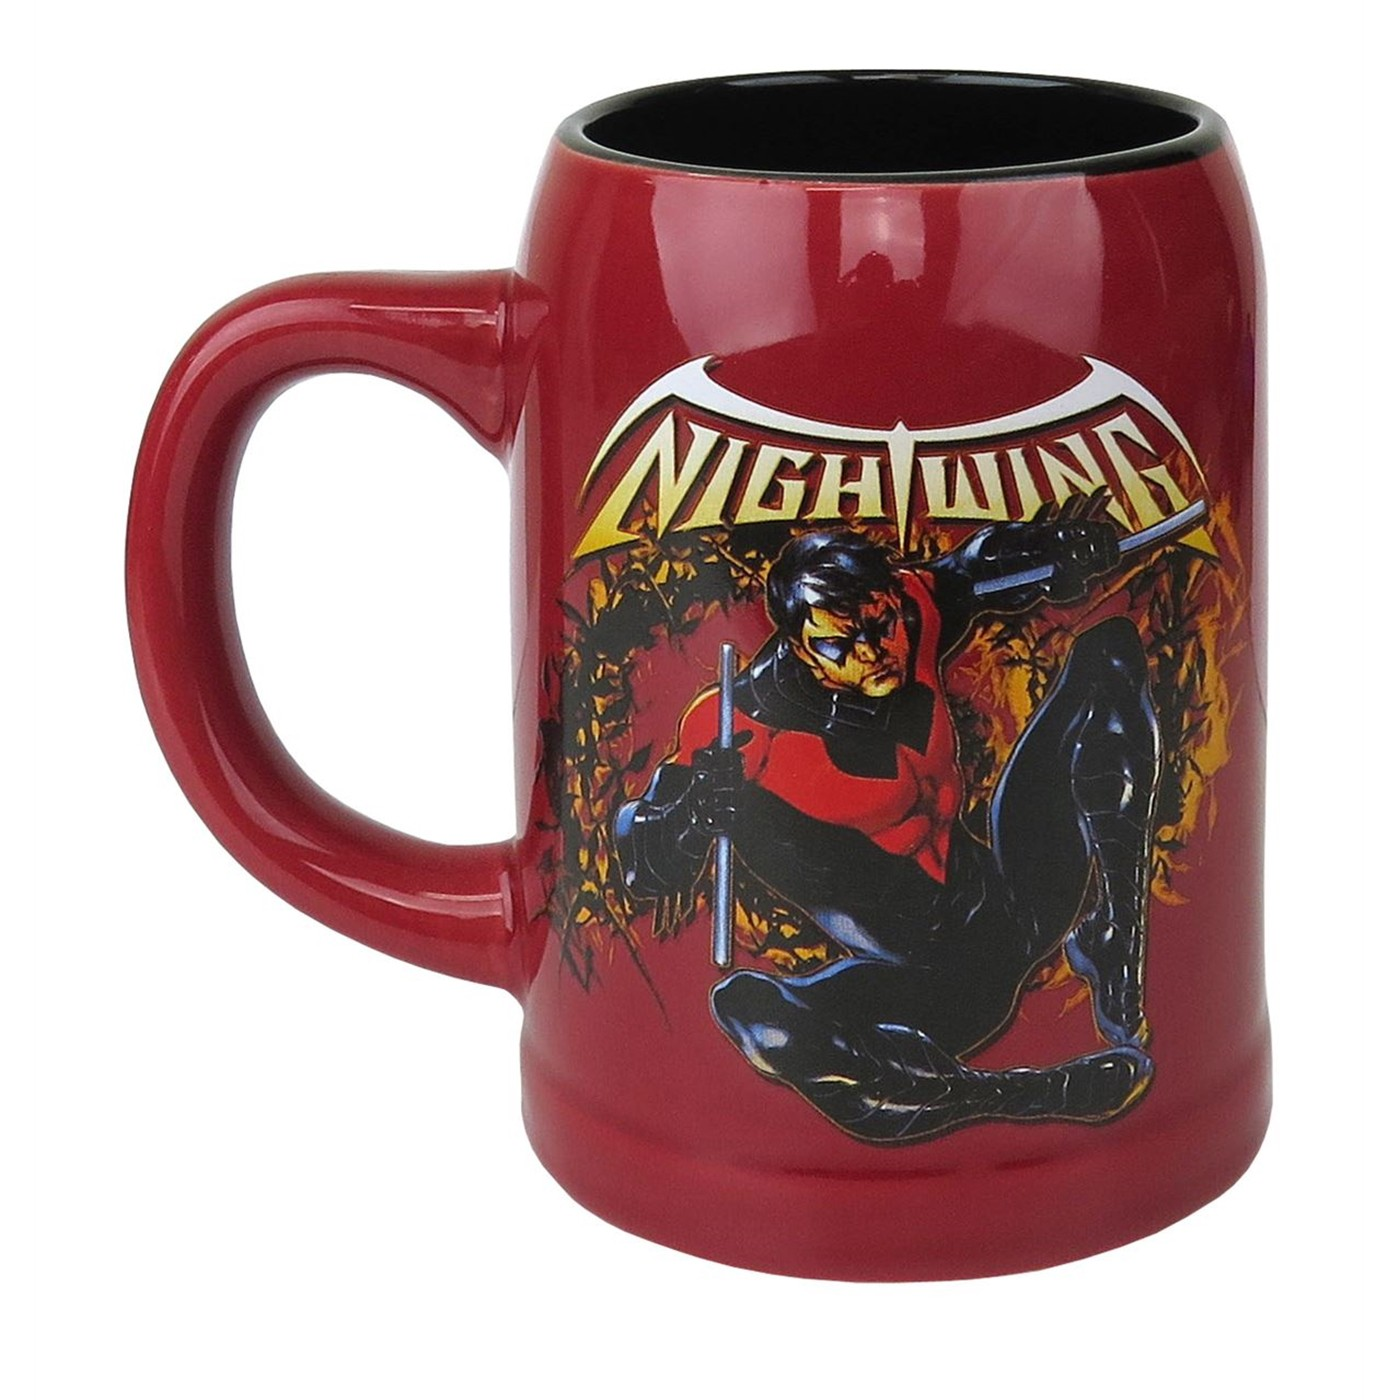 Nightwing 22oz Ceramic Stein Mug